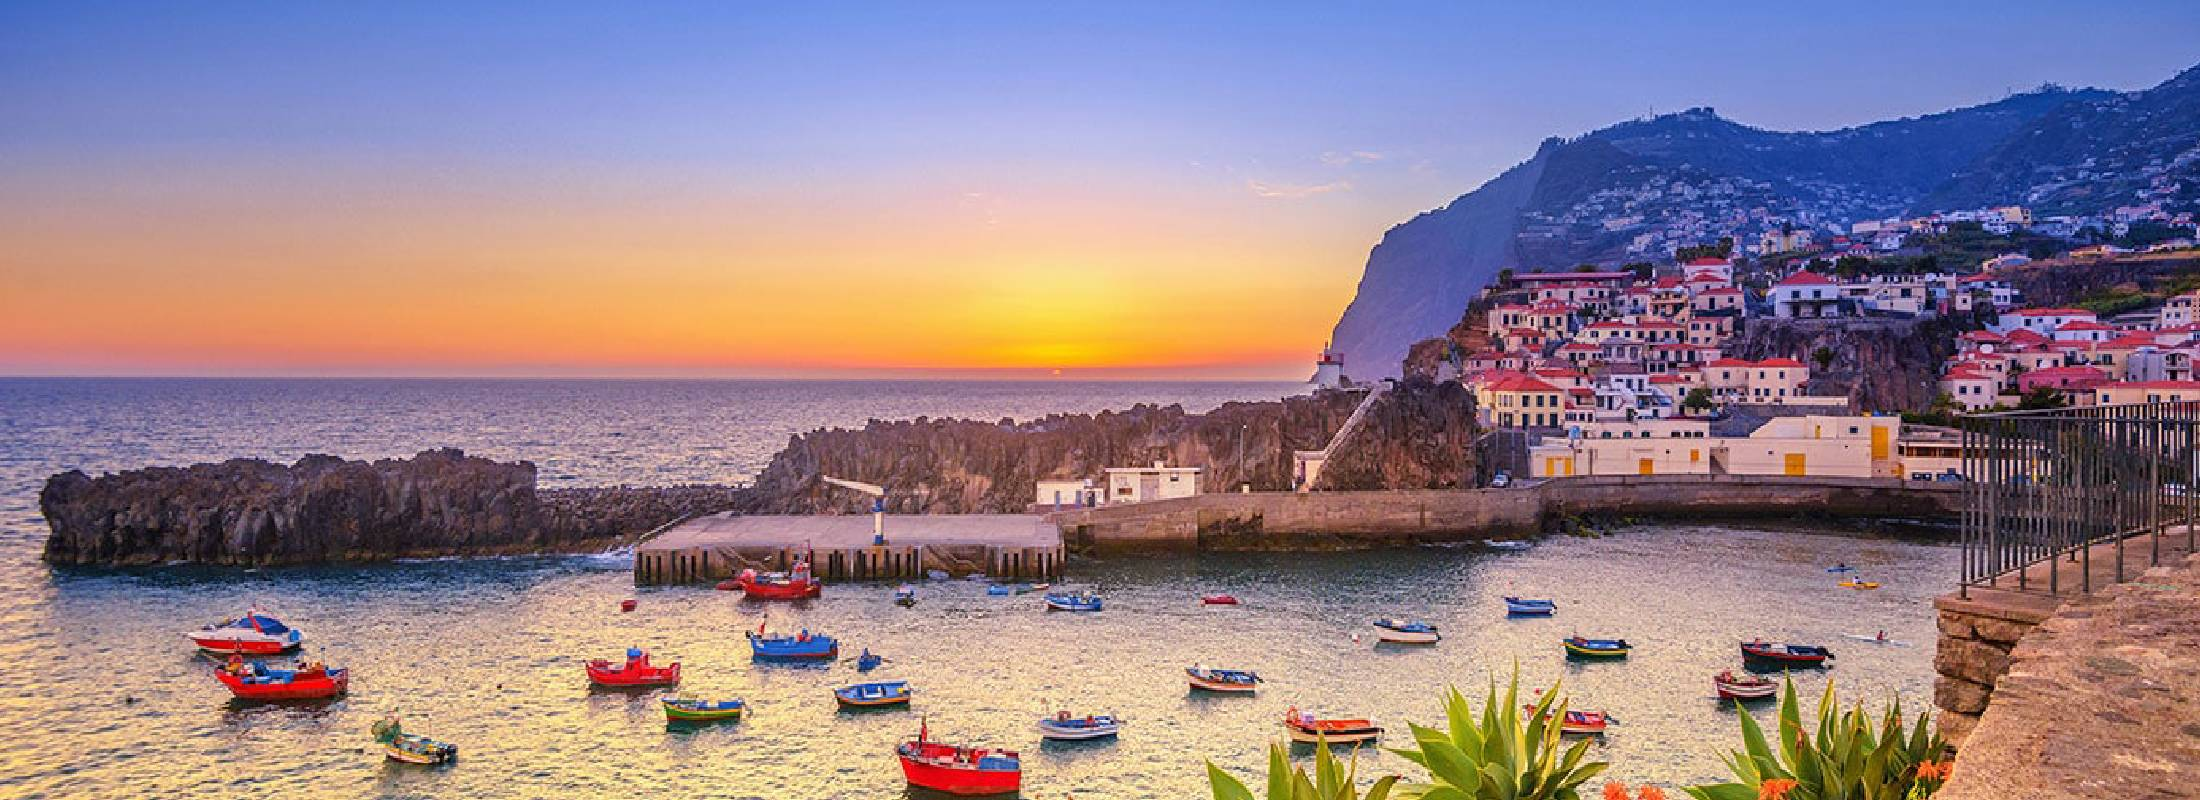 Funchal Madeira rutas senderismo